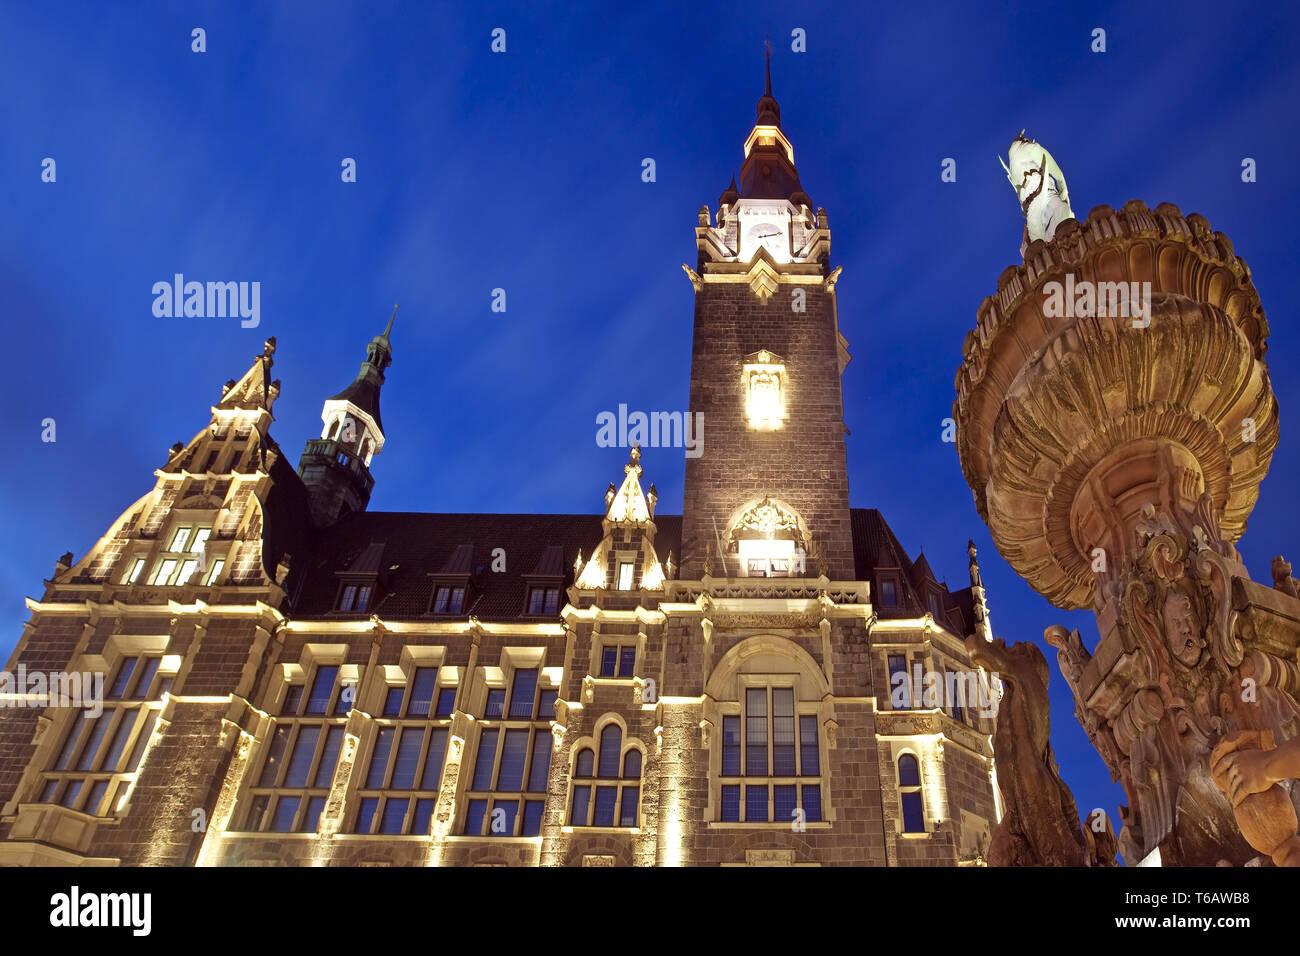 Illuminated town hall Elberfeld with Jubilee Fountain, Wuppertal, North Rhine-Westphalia, Germany - Stock Image